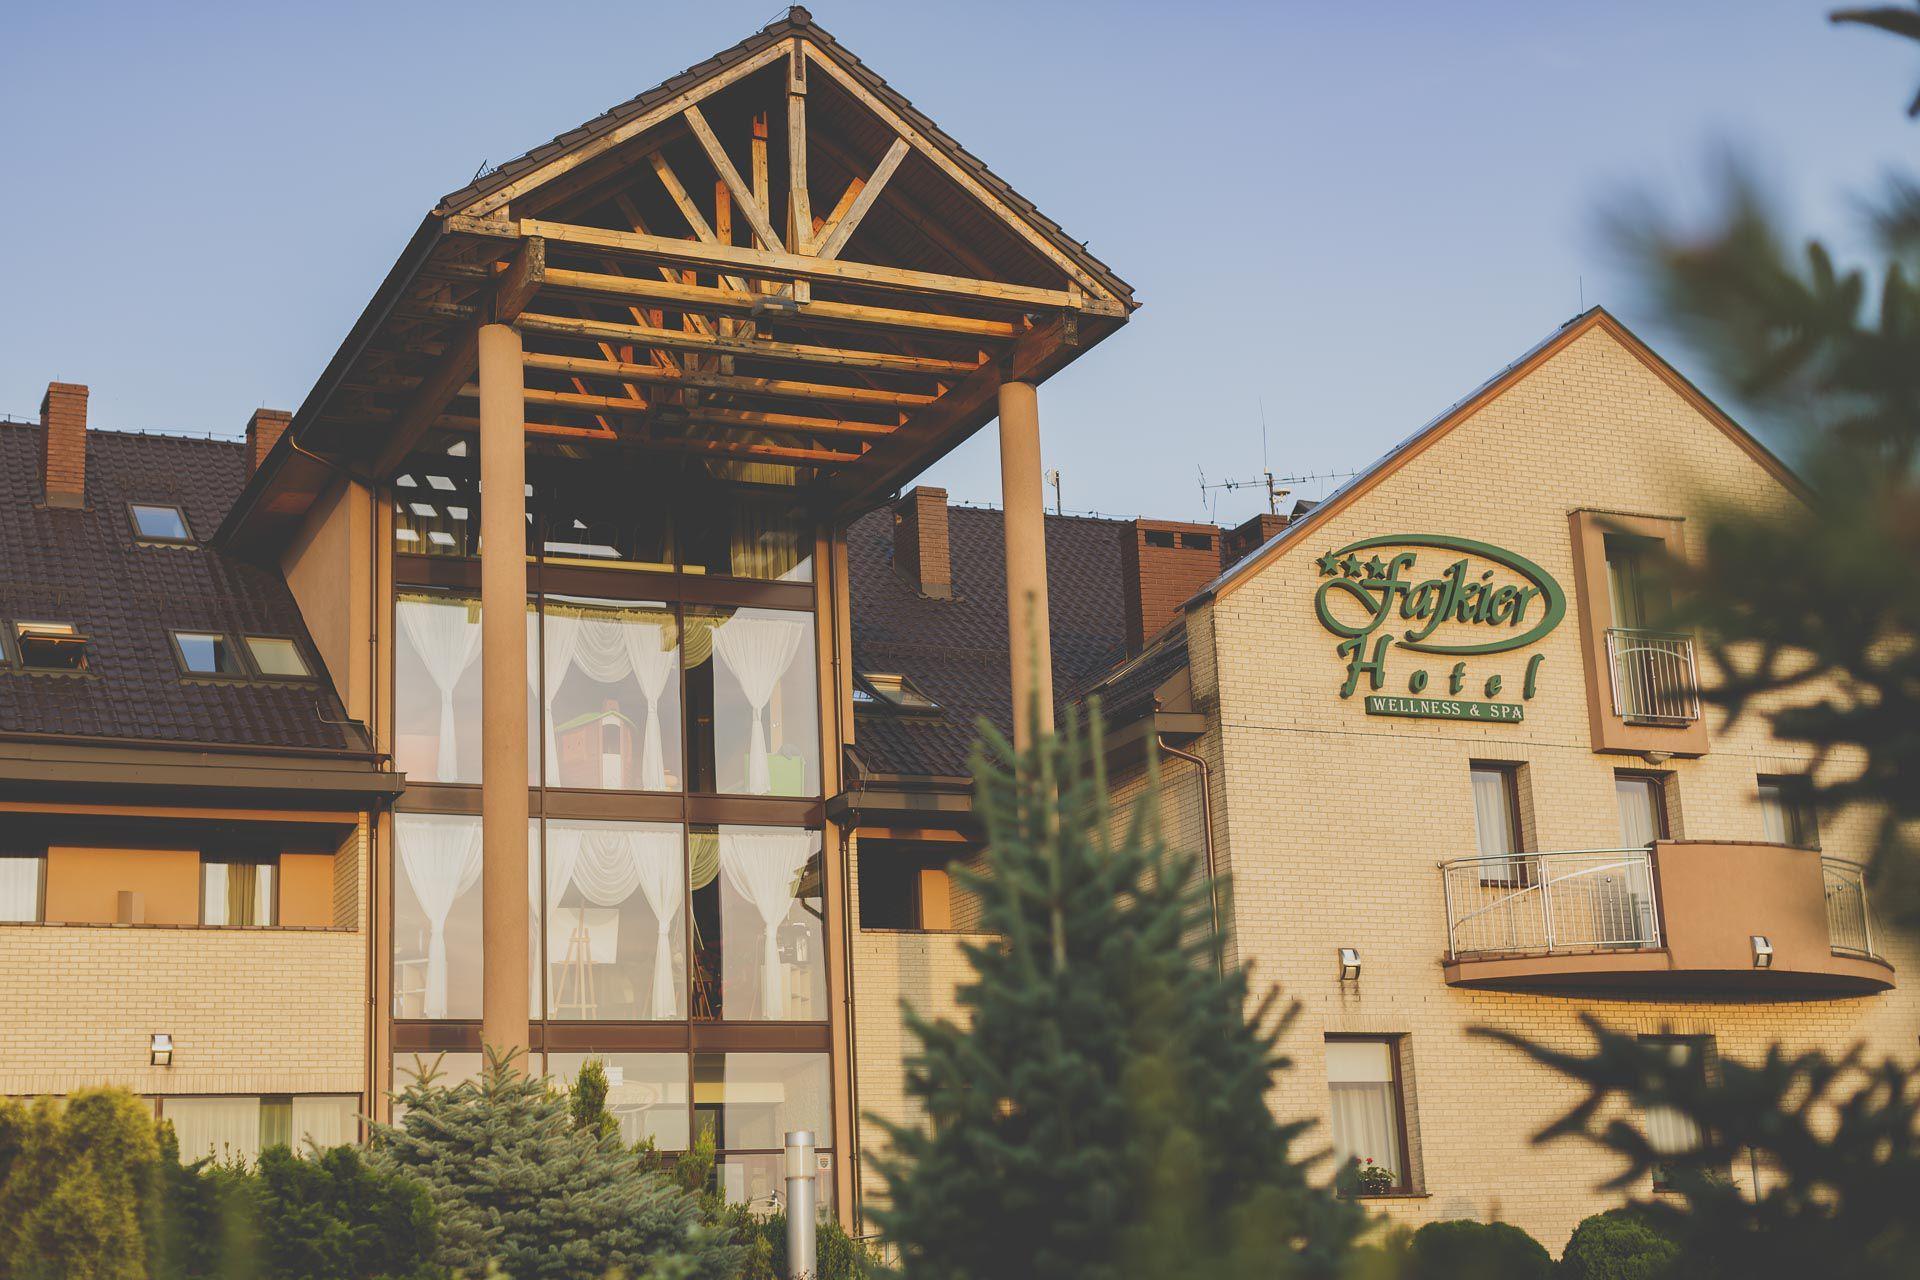 Hotel Fajkier Wellness & SPA - Lgota Murowana